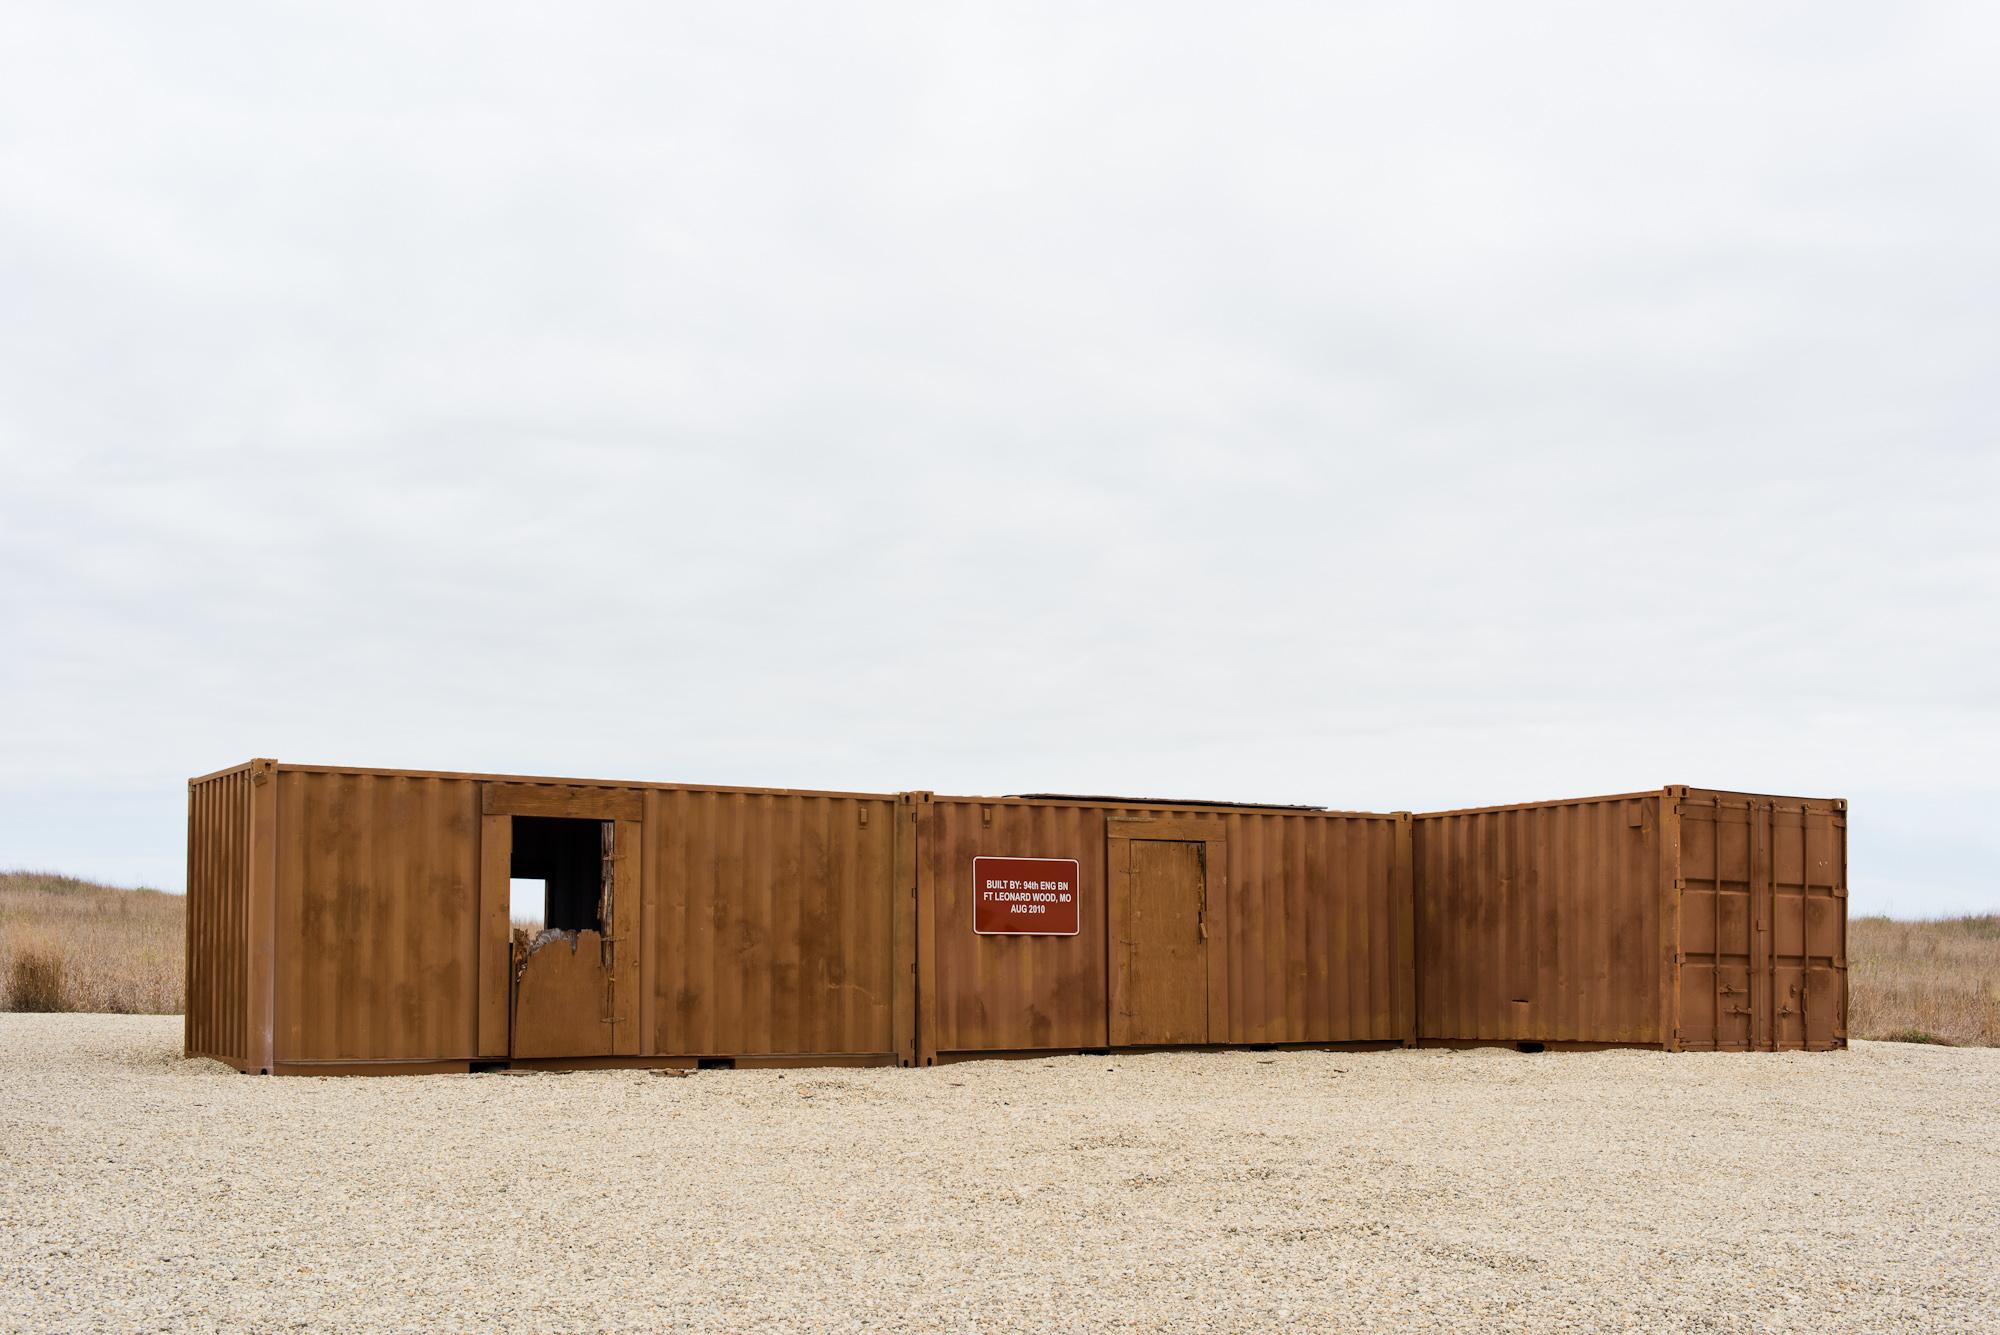 14. Forced Entry, Live Fire Village #3, Fort Riley, KS